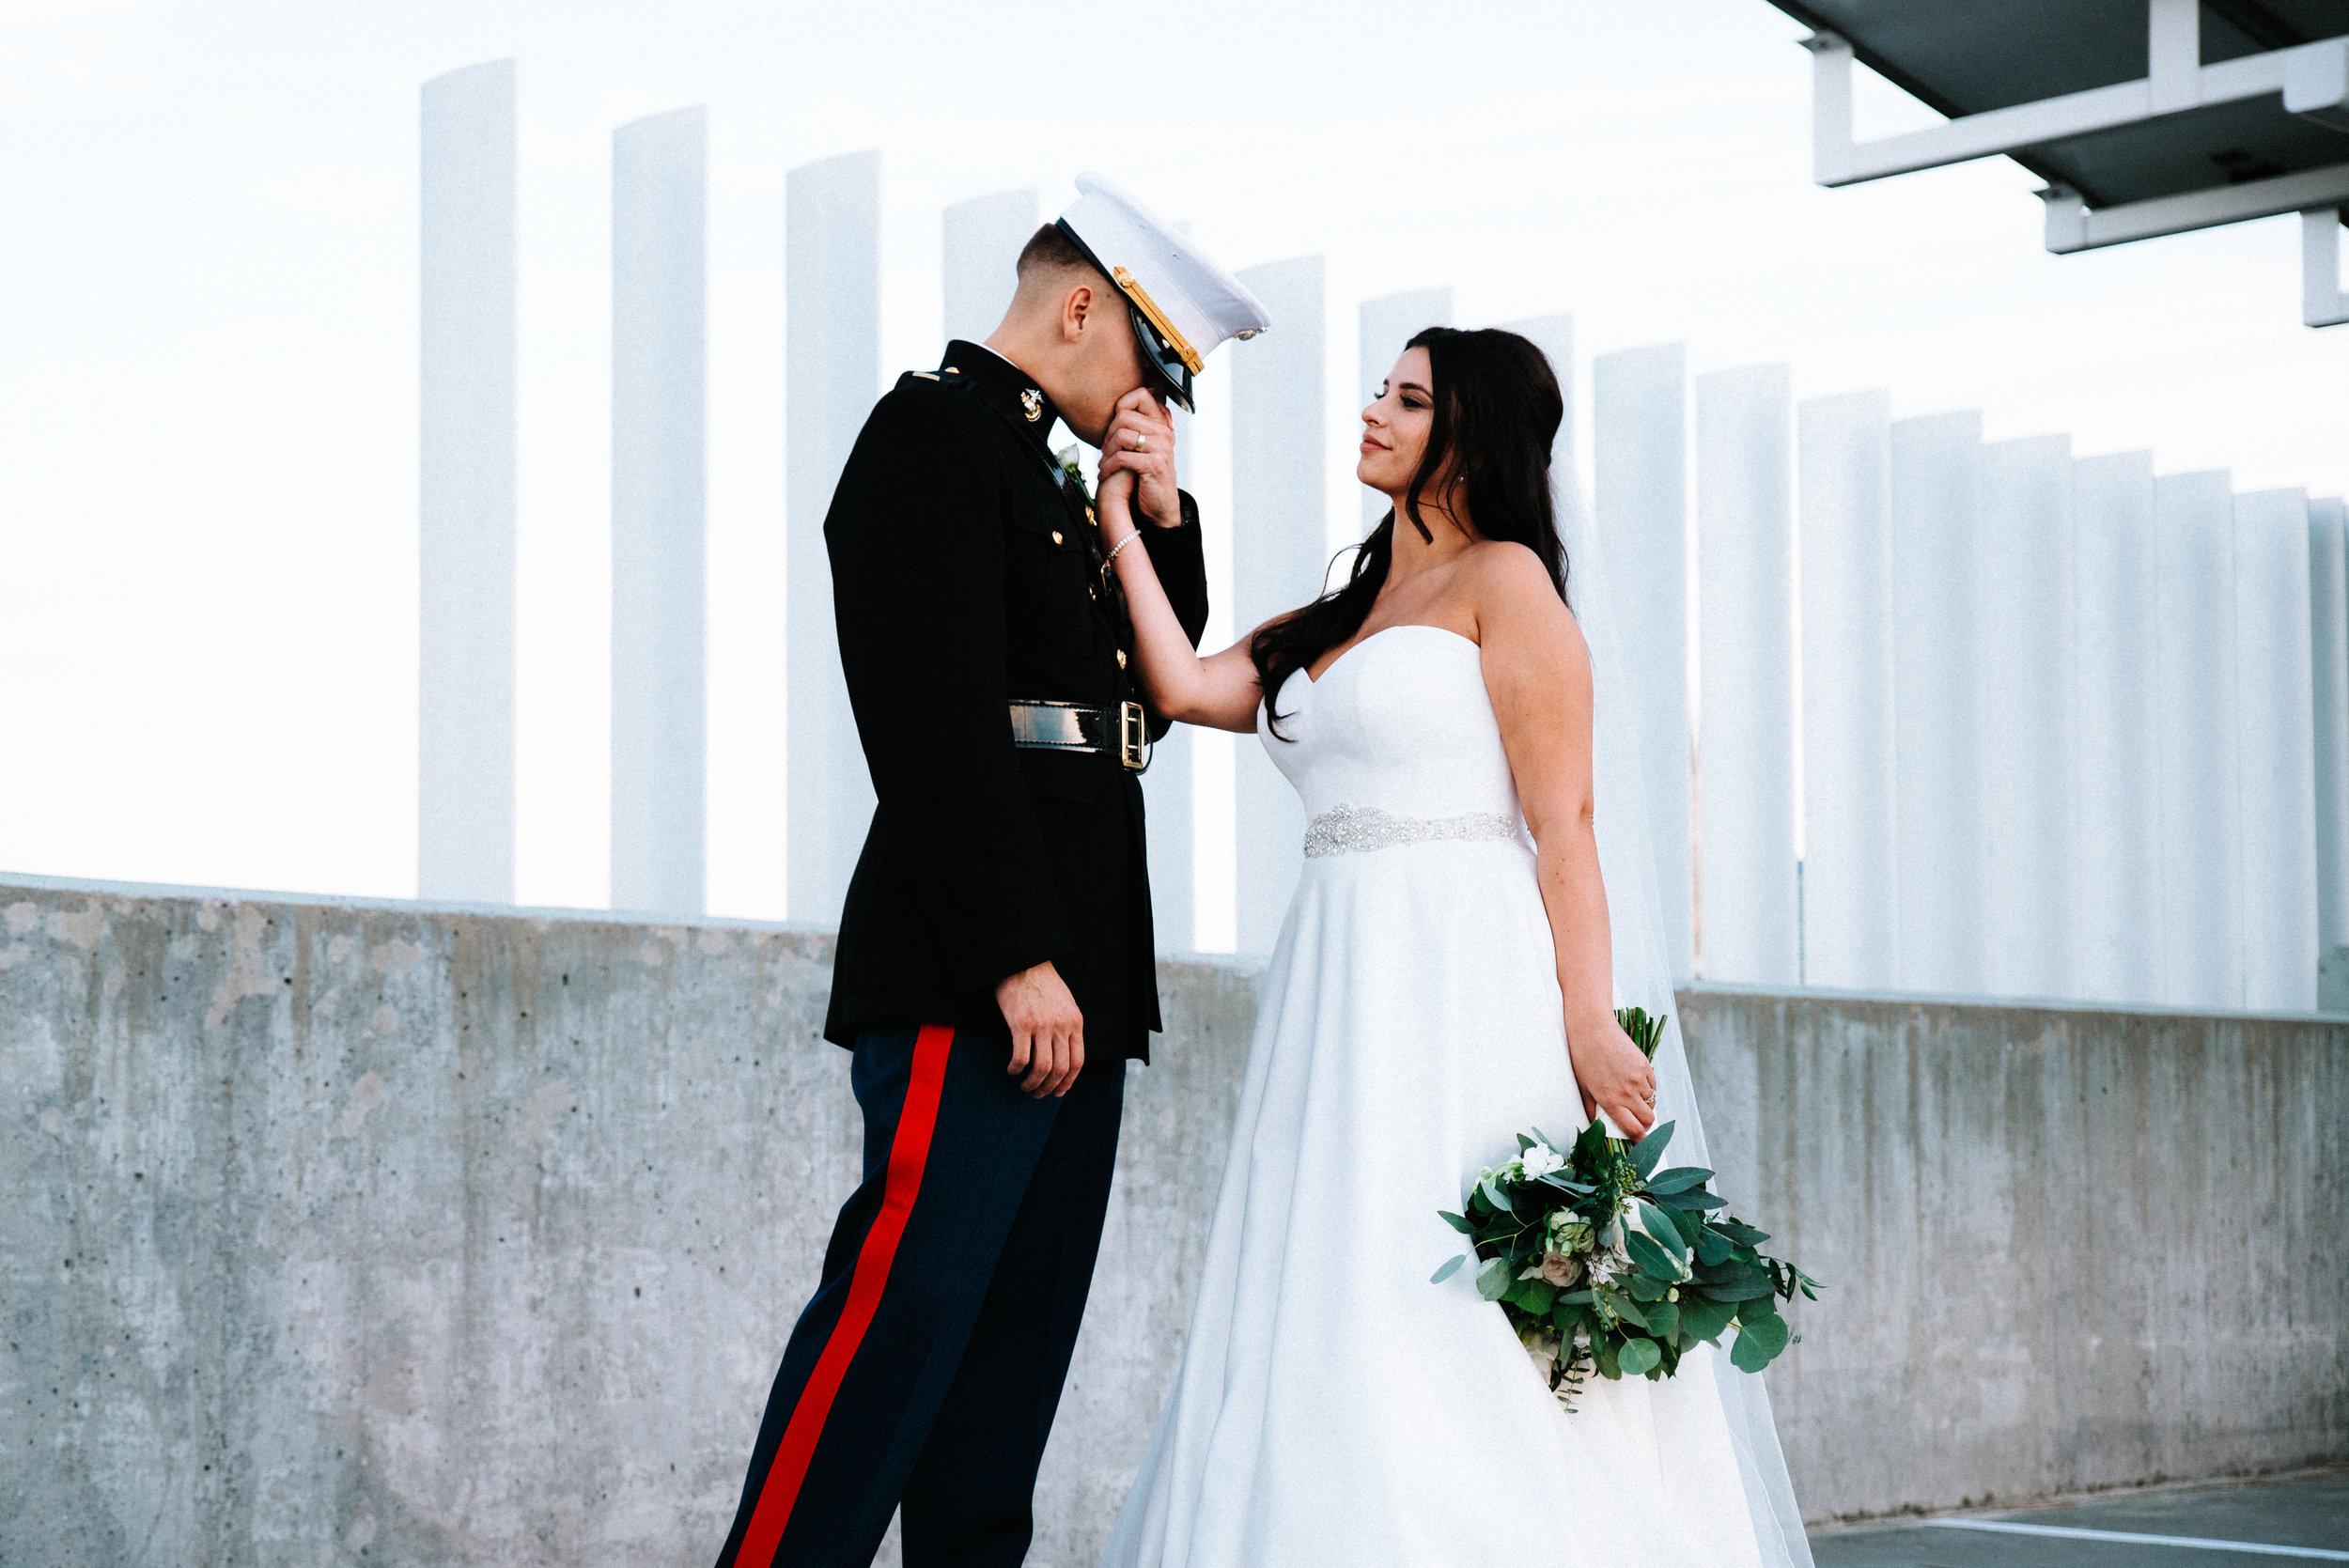 +Raleigh Wedding +North Carolina +Photographer +Wedding Photographer +Engagement Photographer +All Saints Chapel-6955.jpg